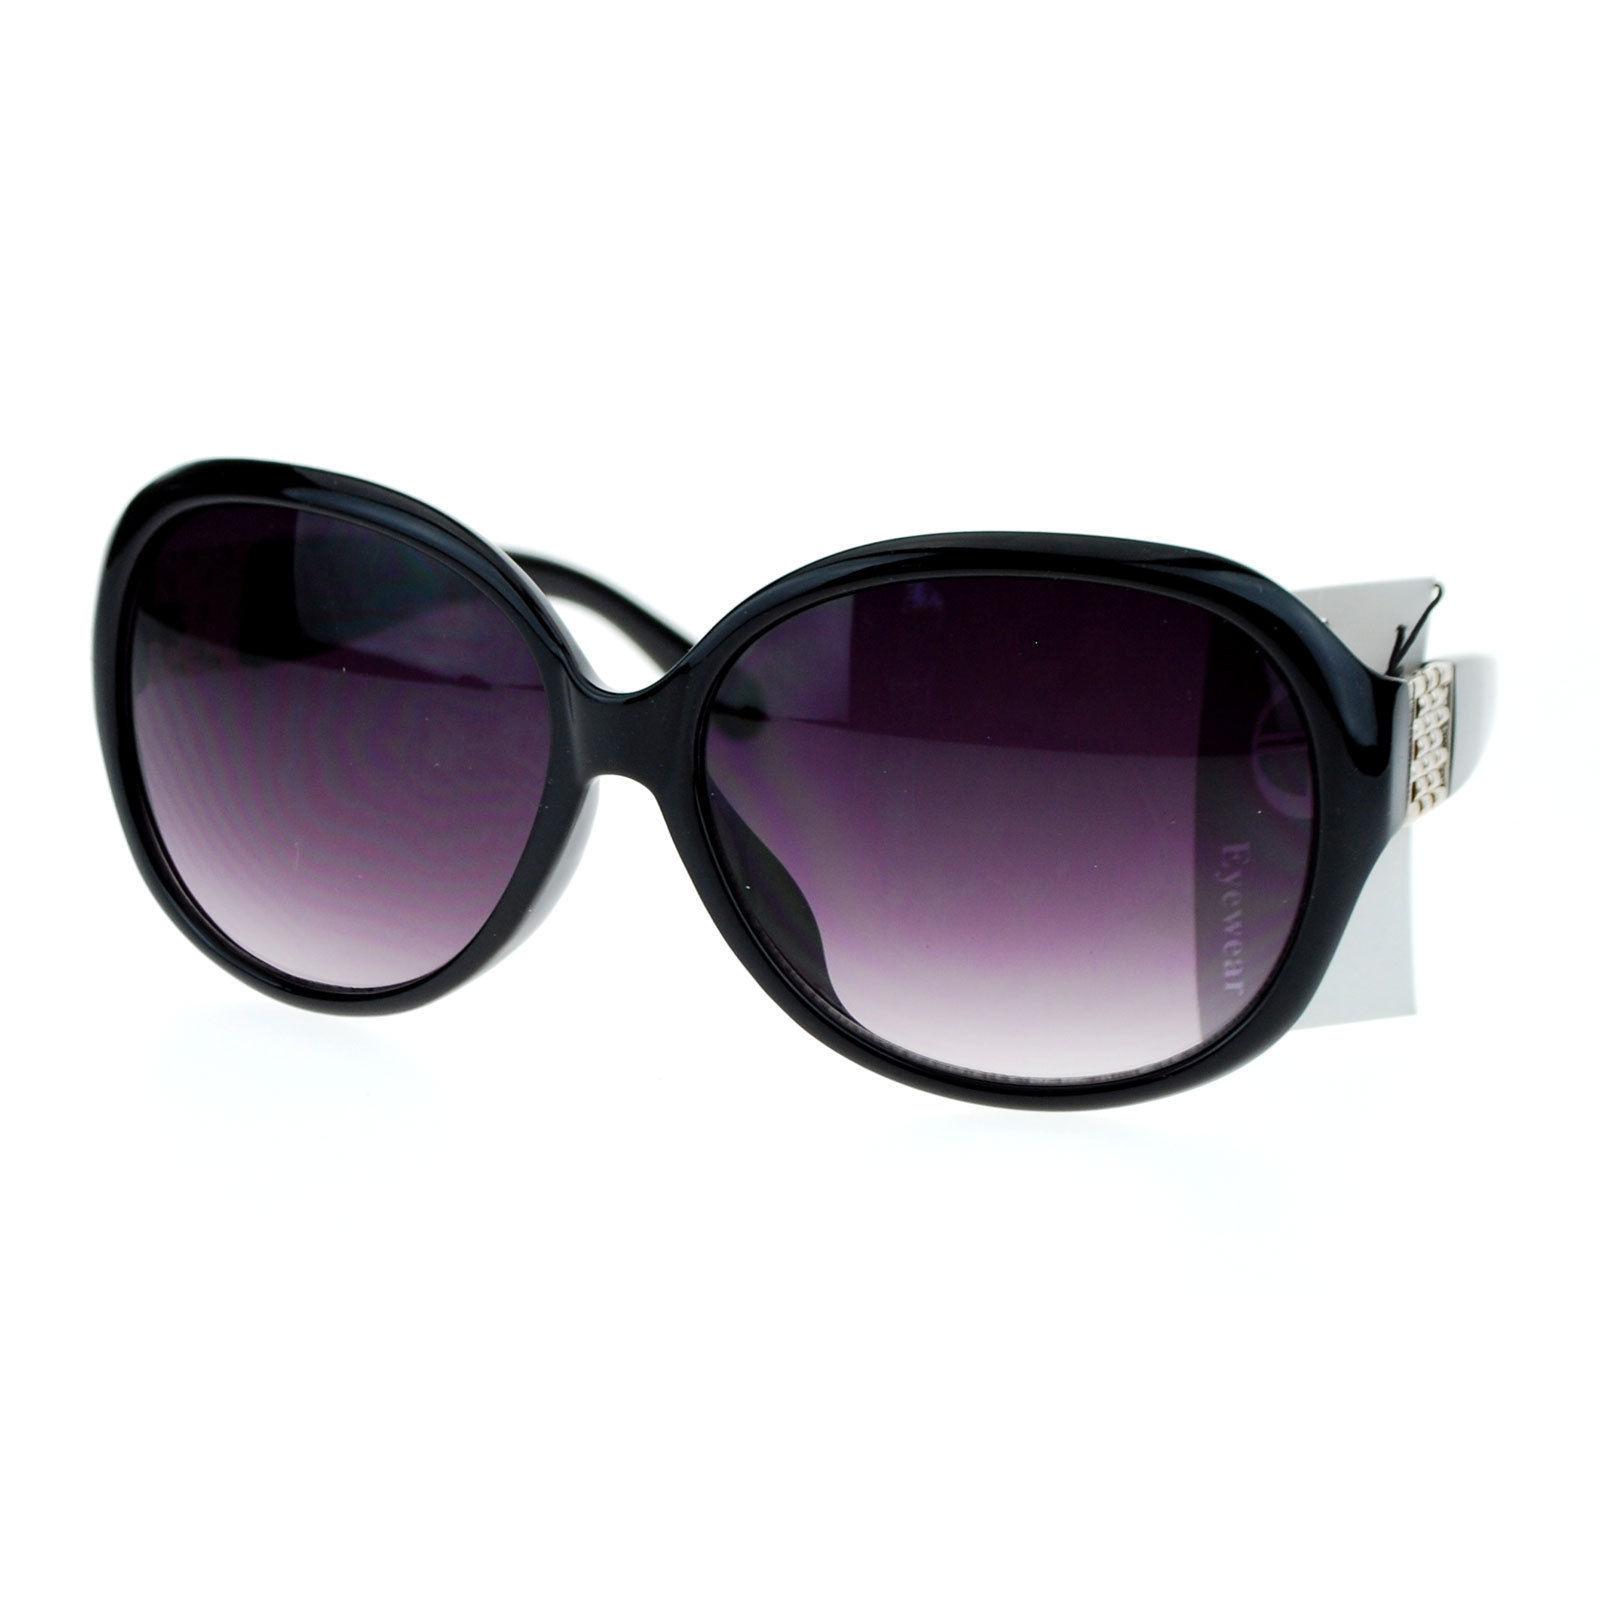 Fashion Womens Sunglasses Oversized Round Designer Frame